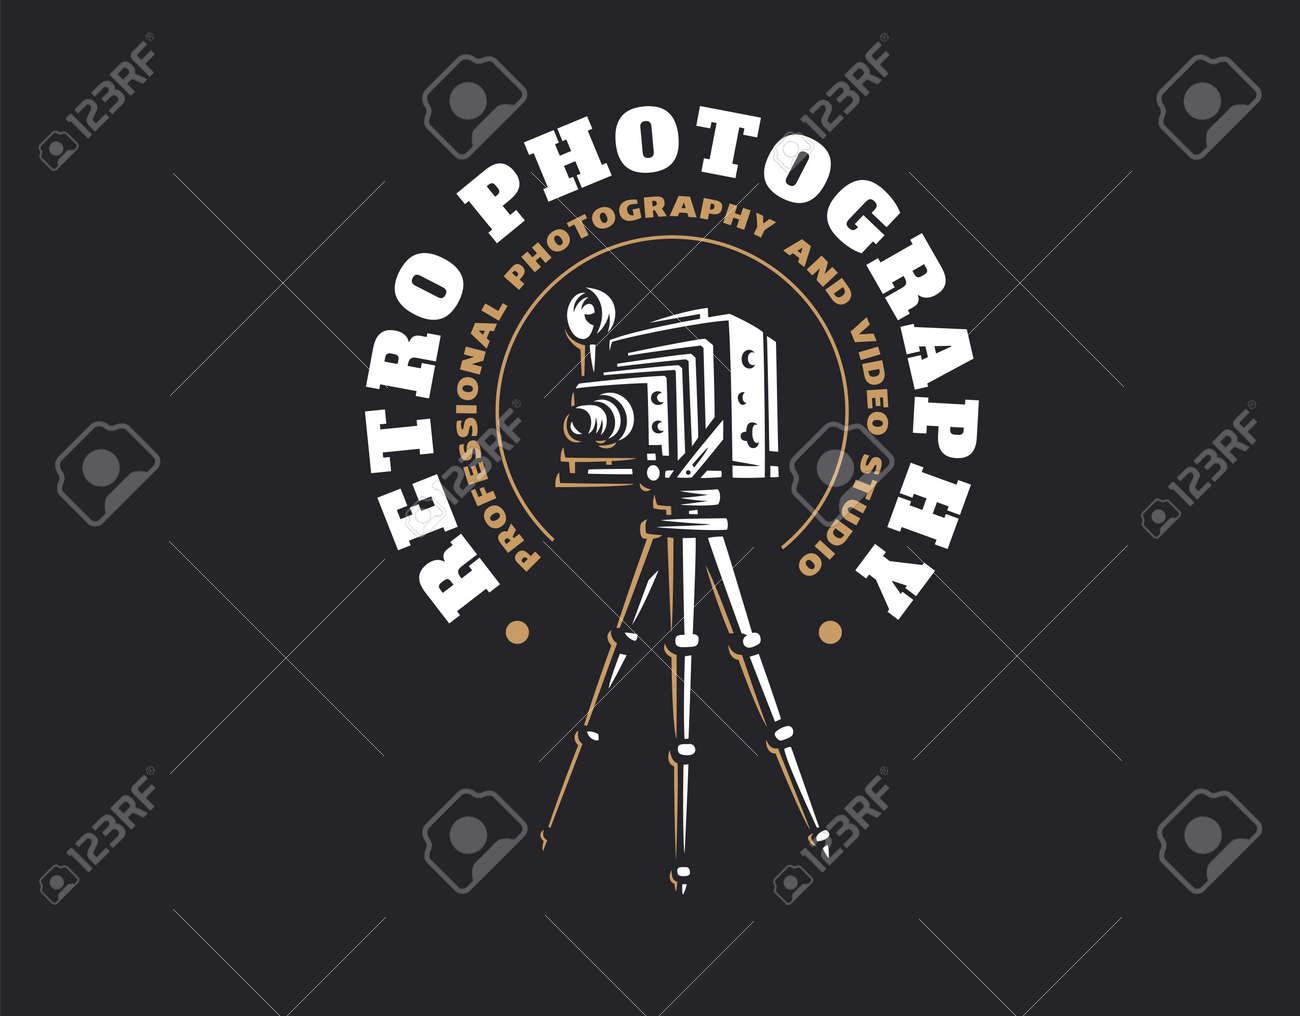 Retro photo camera logo - vector illustration. Vintage emblem design - 84910053